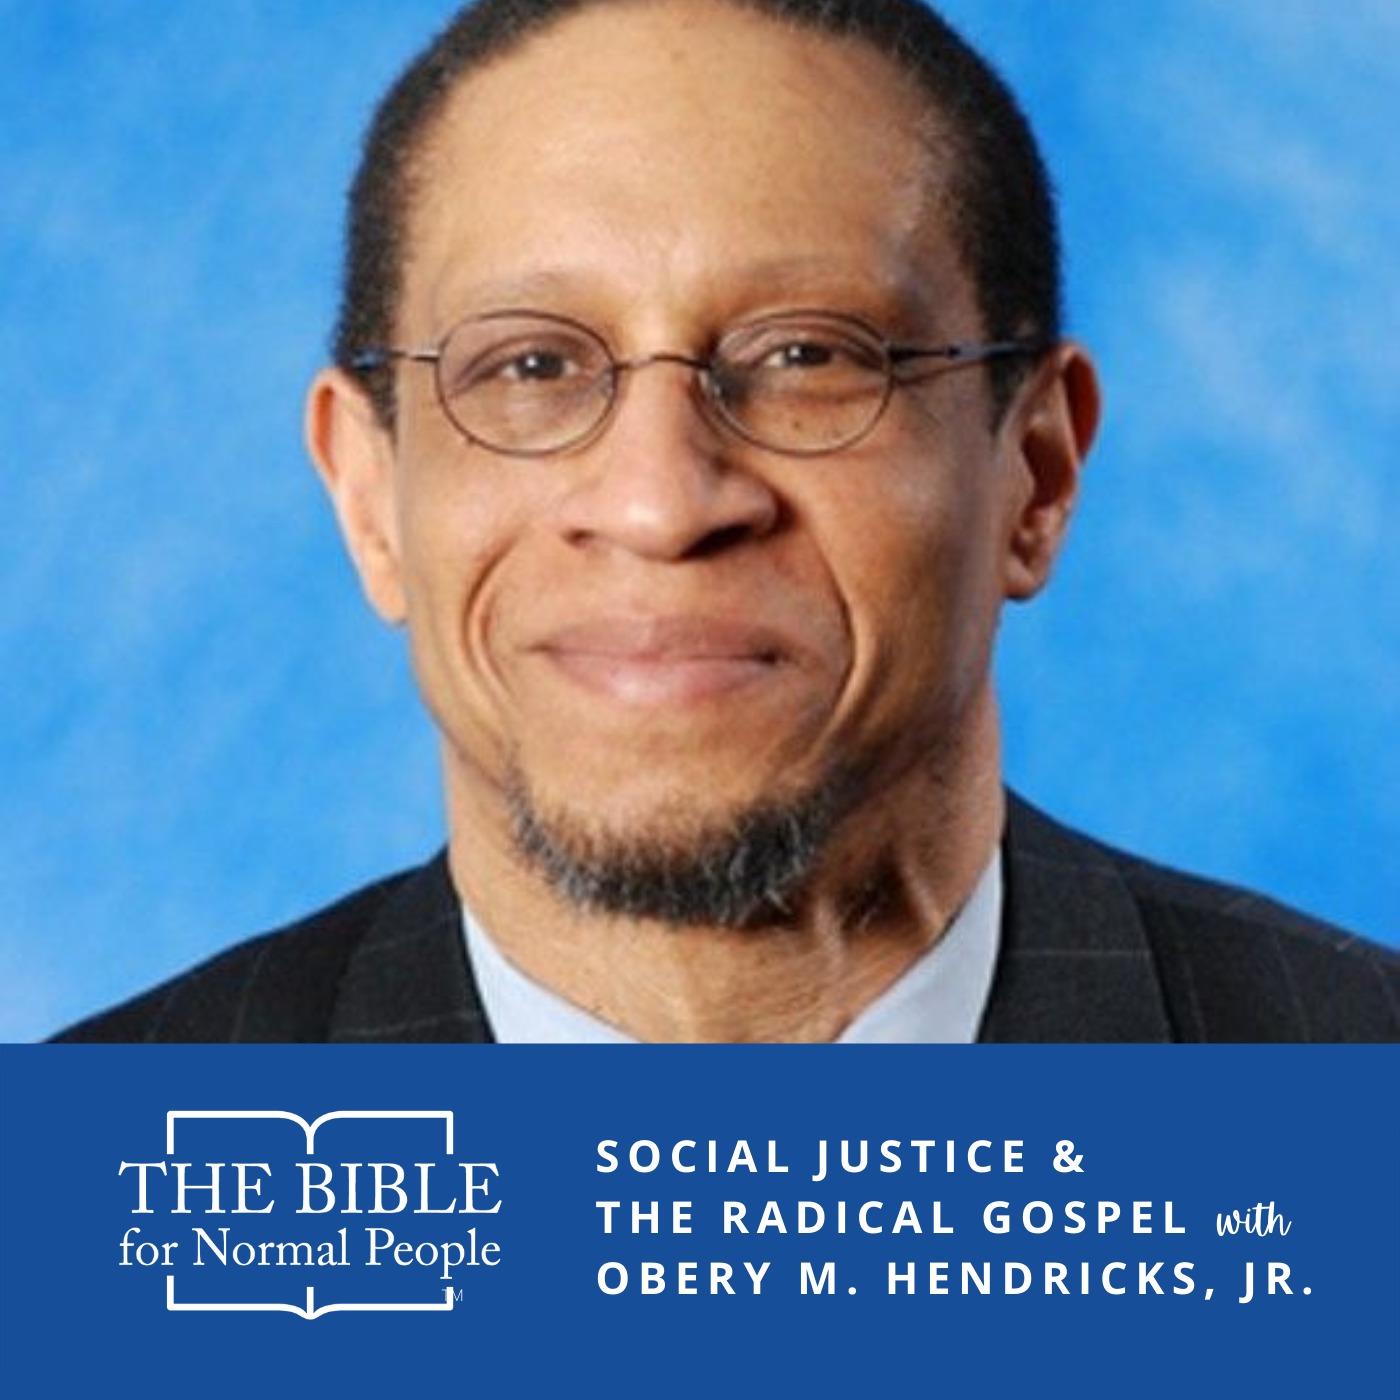 Episode 177: Obery M. Hendricks, Jr. - Social Justice & the Radical Gospel